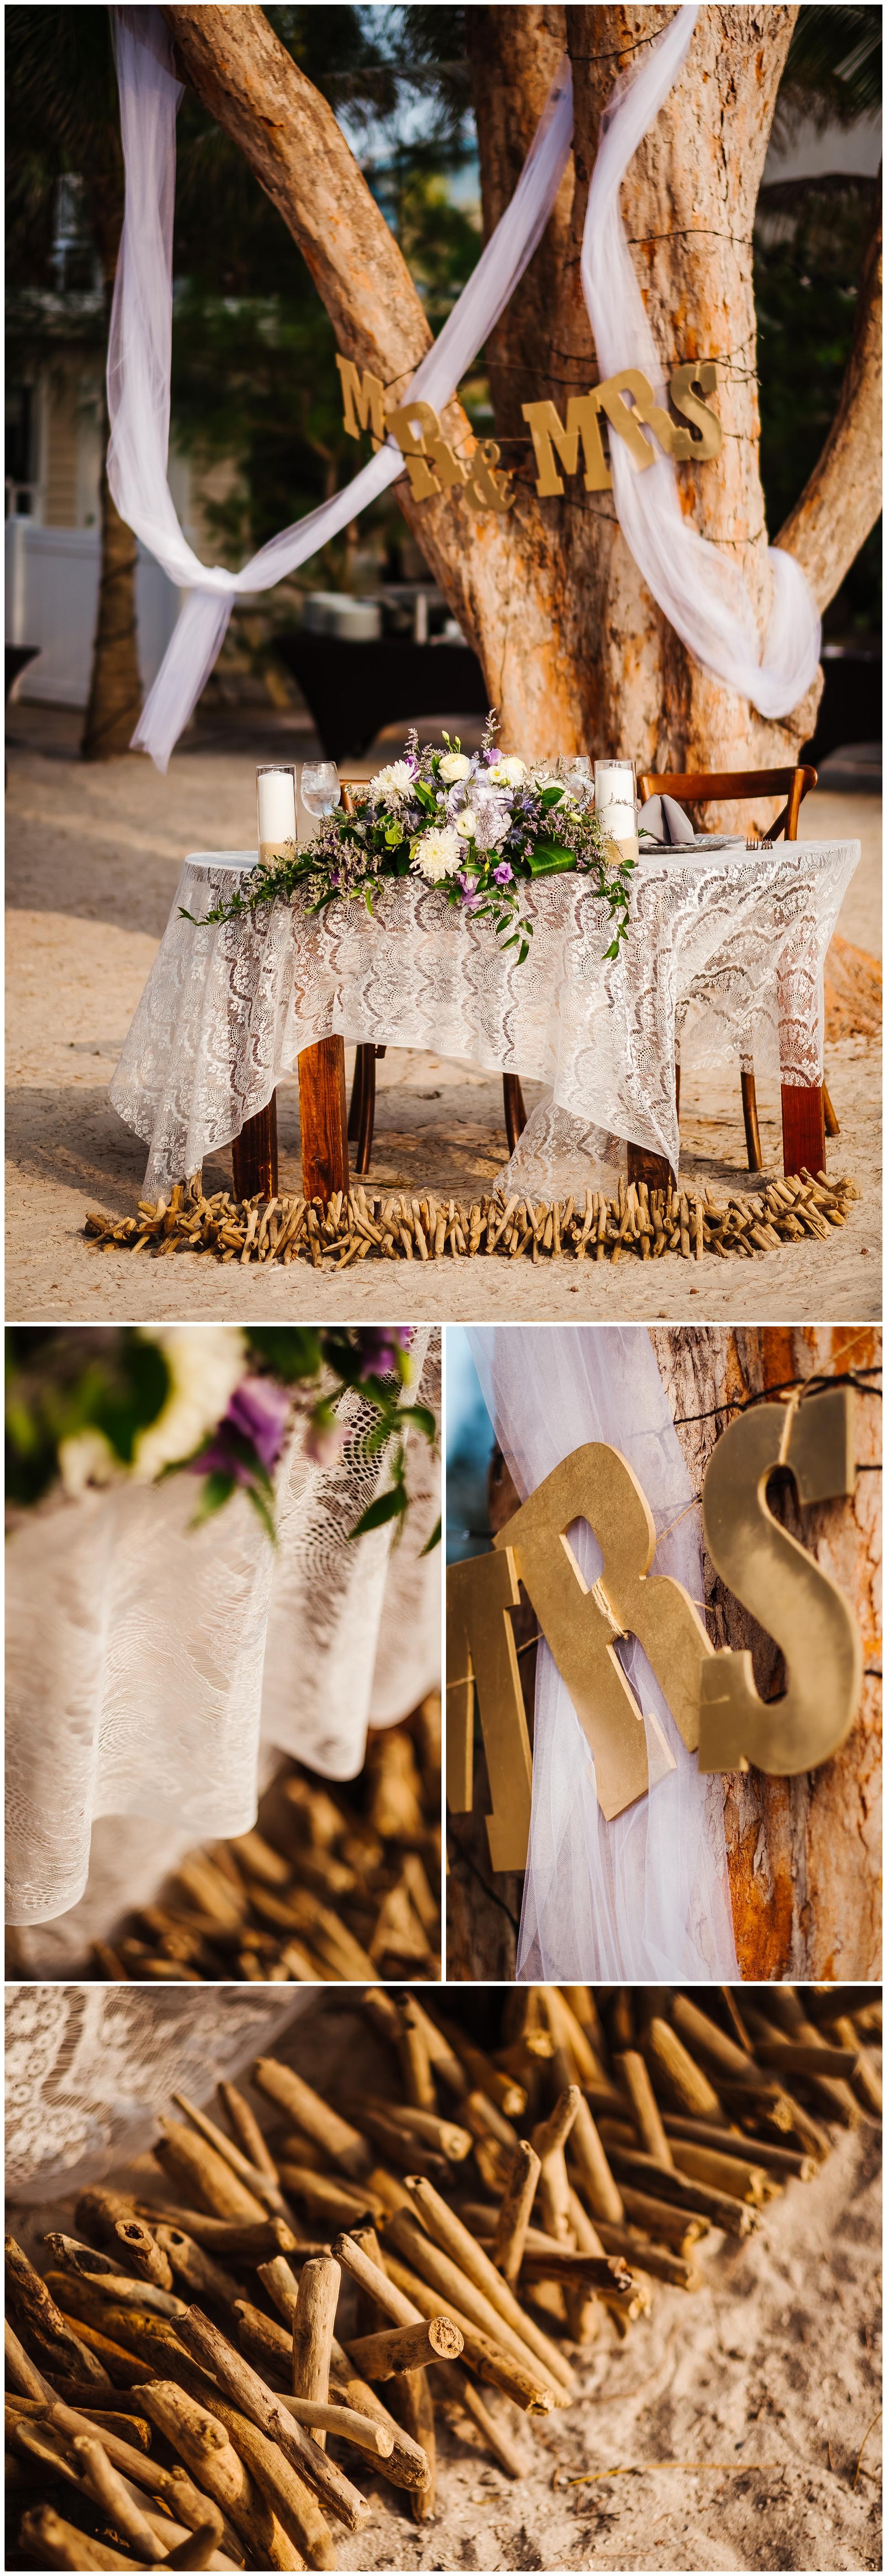 tampa-st-pete-wedding-photographer-indian-rocks-beach-mermaid-train-redhead_0125.jpg